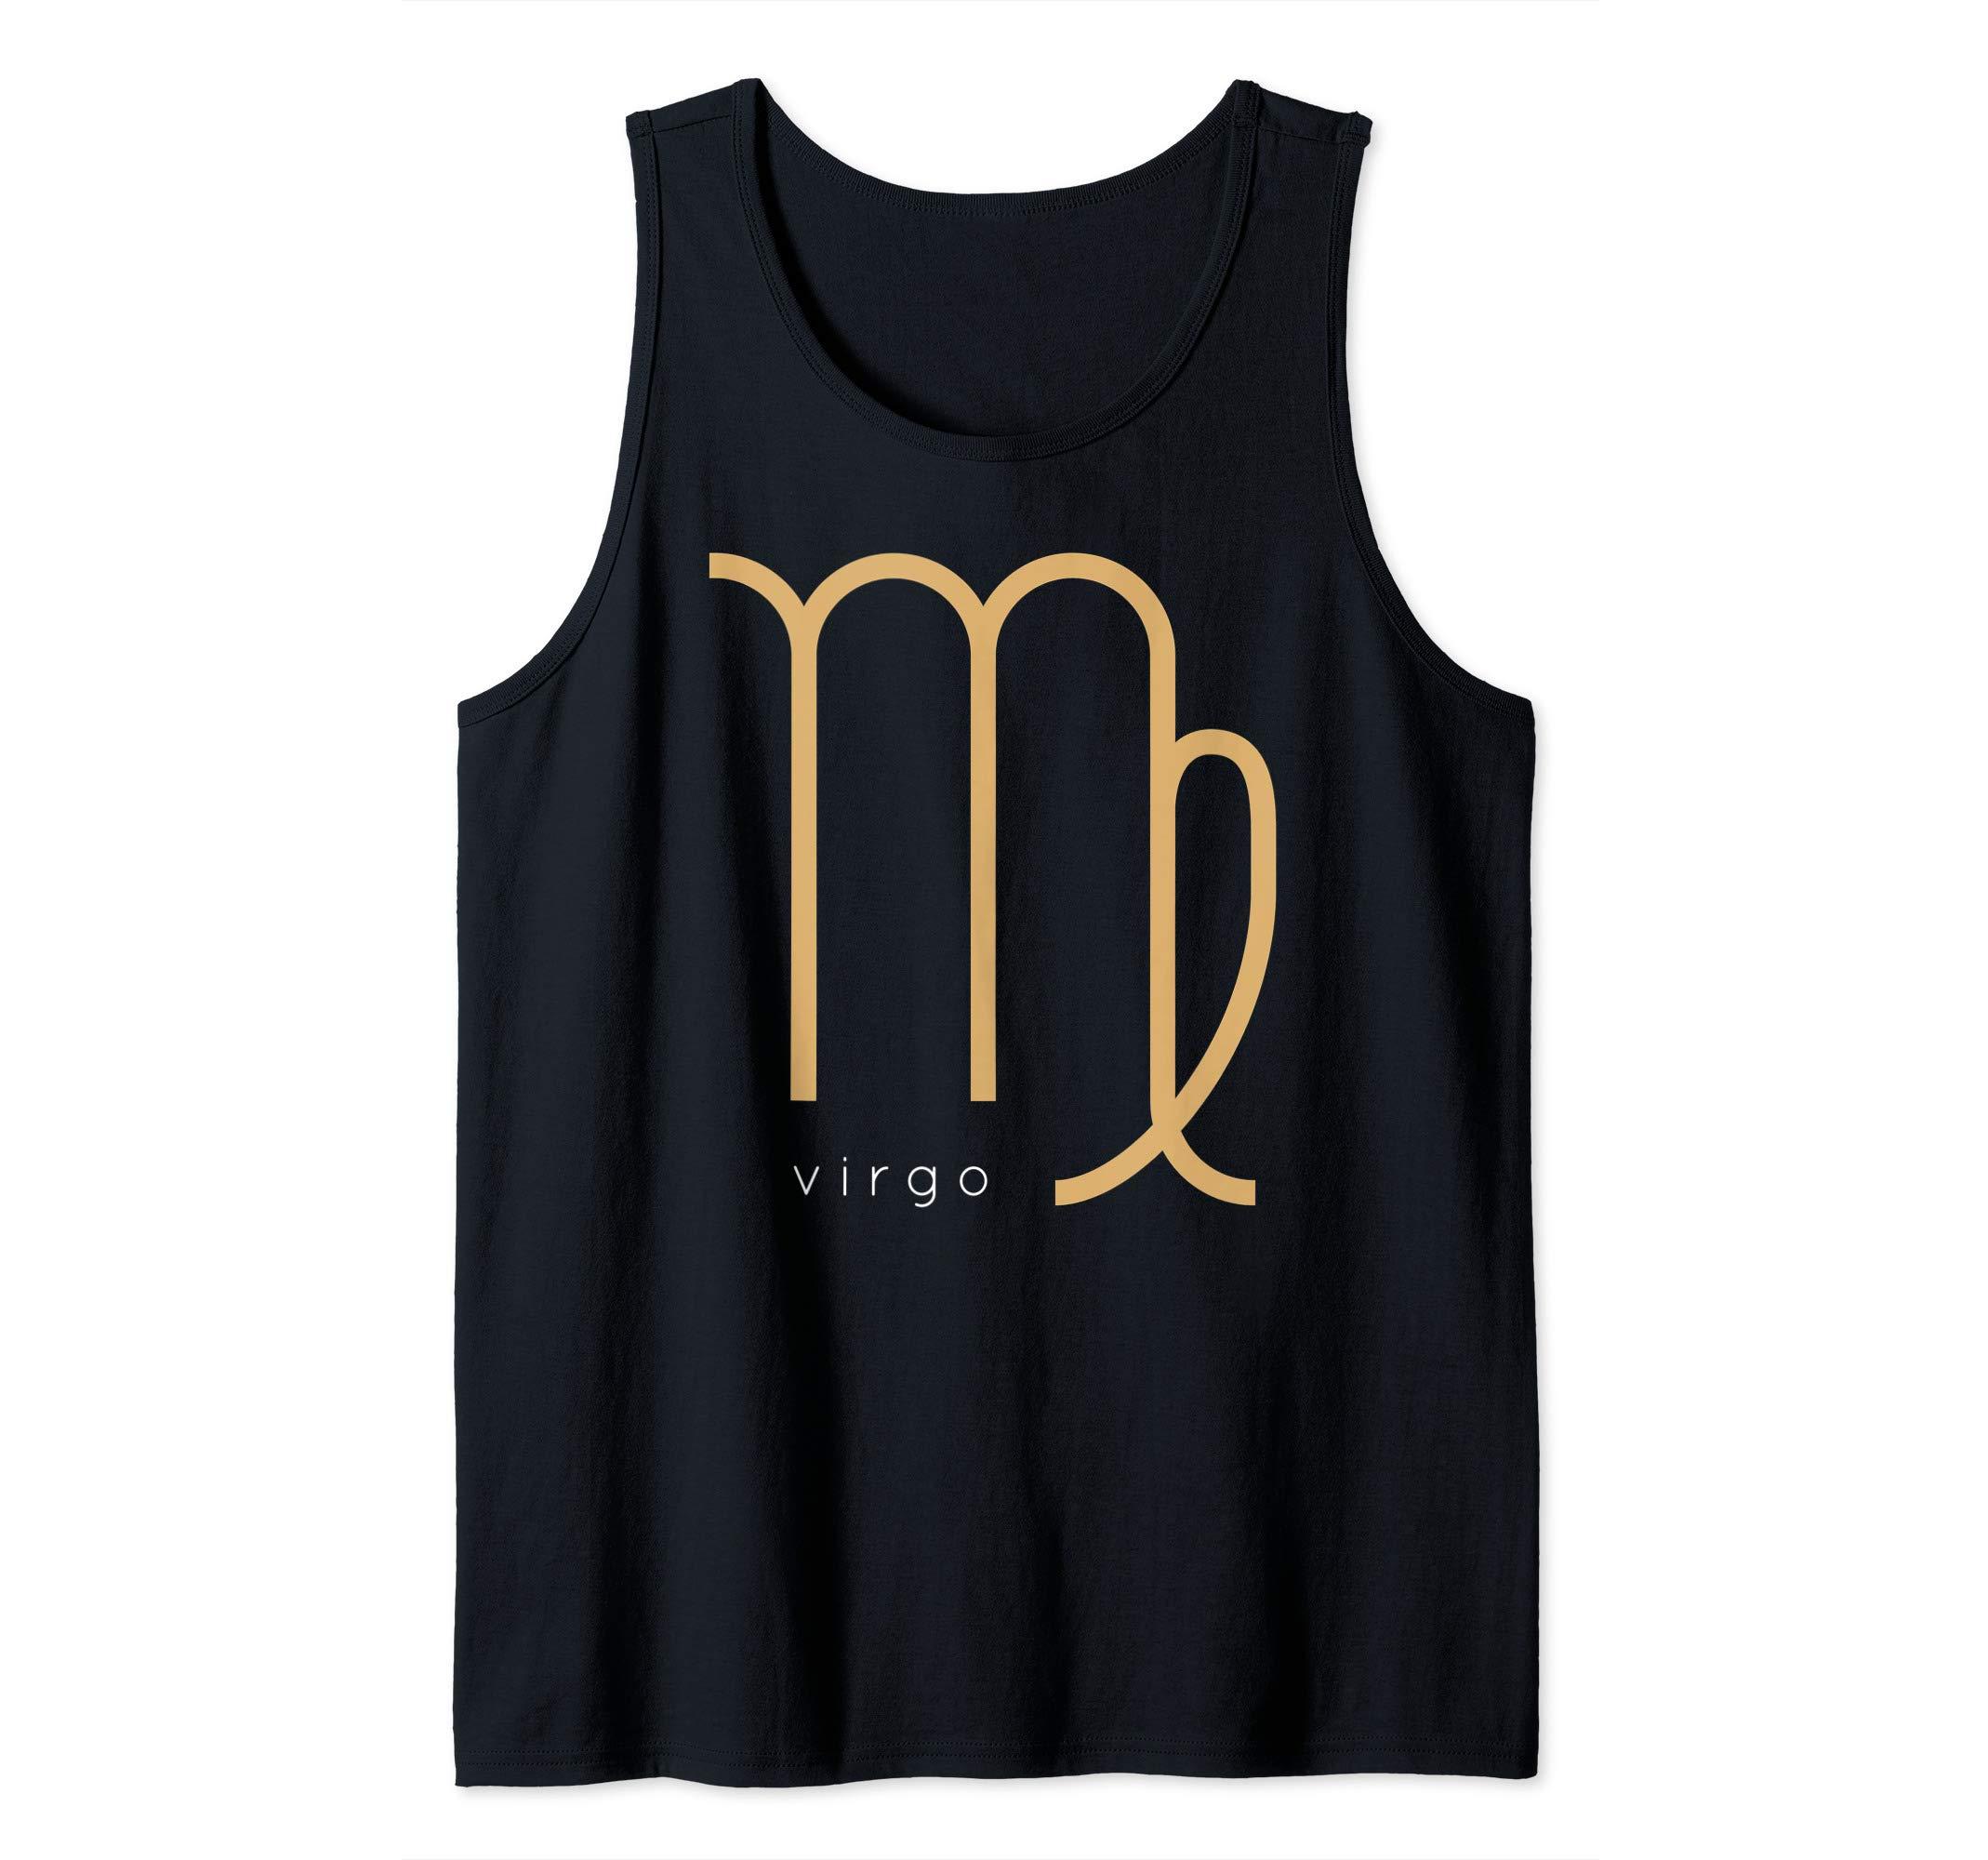 Virgo Horoscope Sign Mens Tank Top Shirt